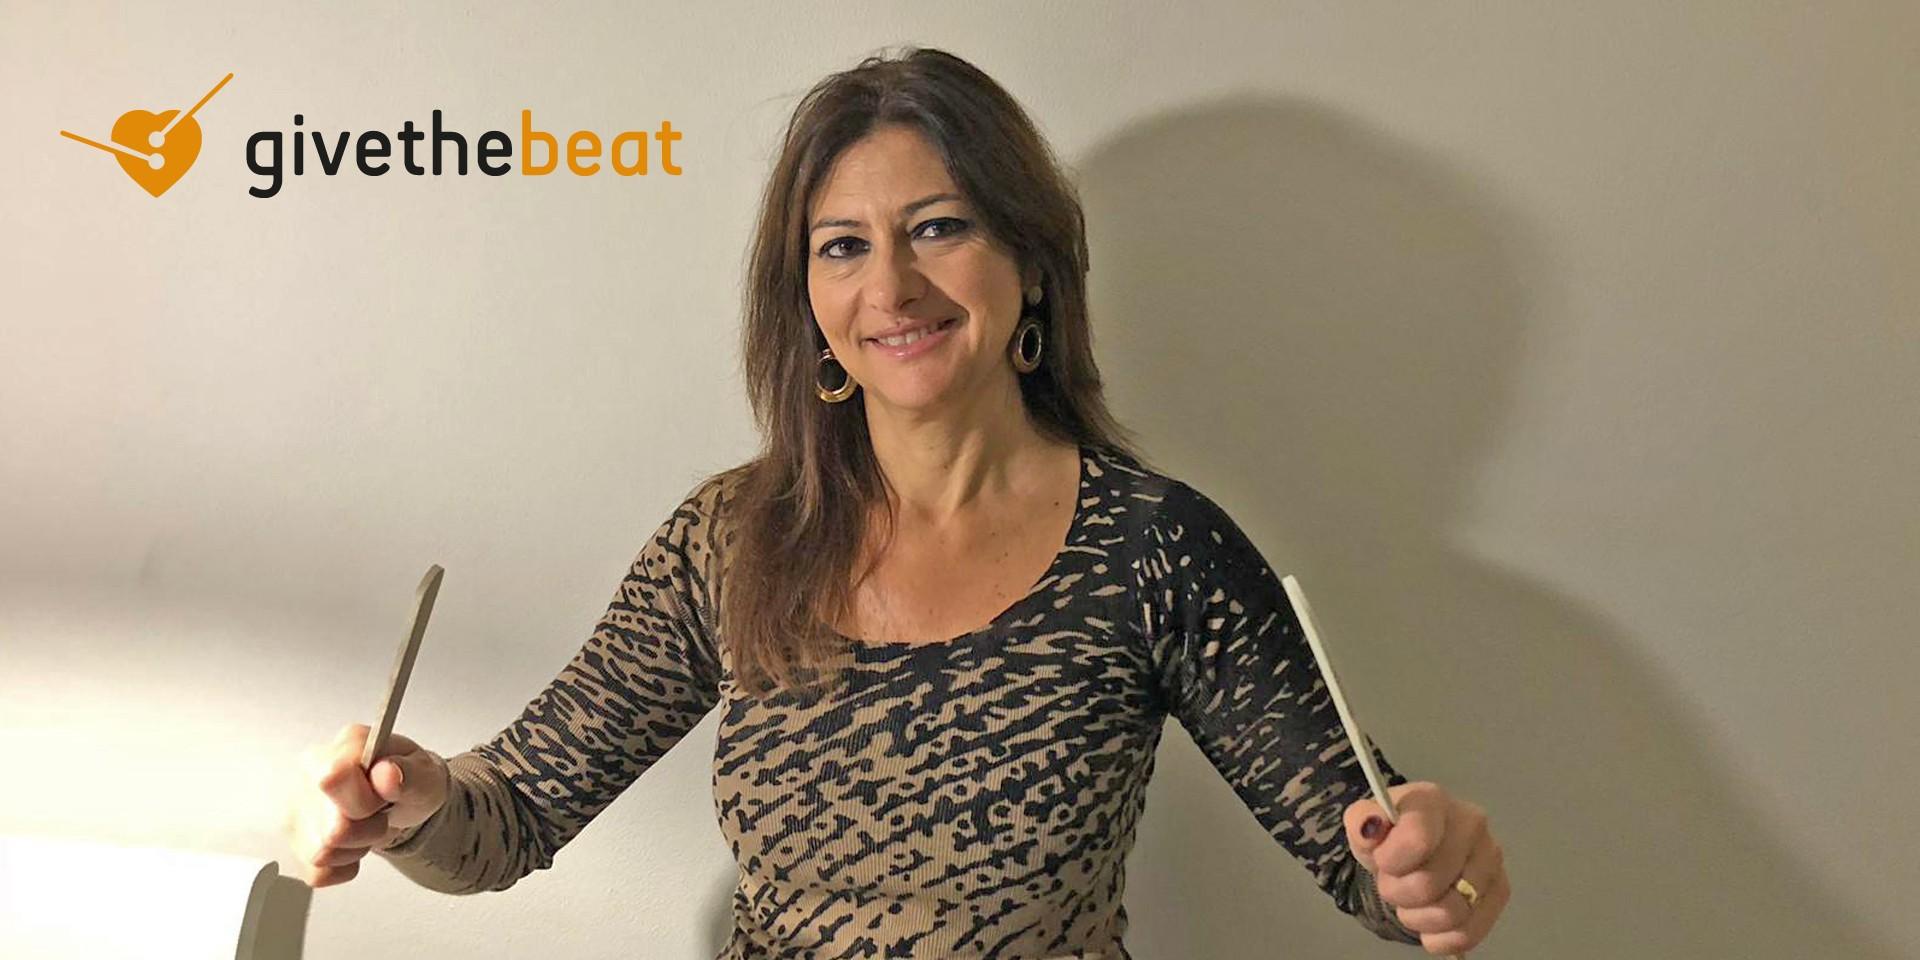 #GivetheBeat - Alessandra Meregalli-Alessandra Meregalli